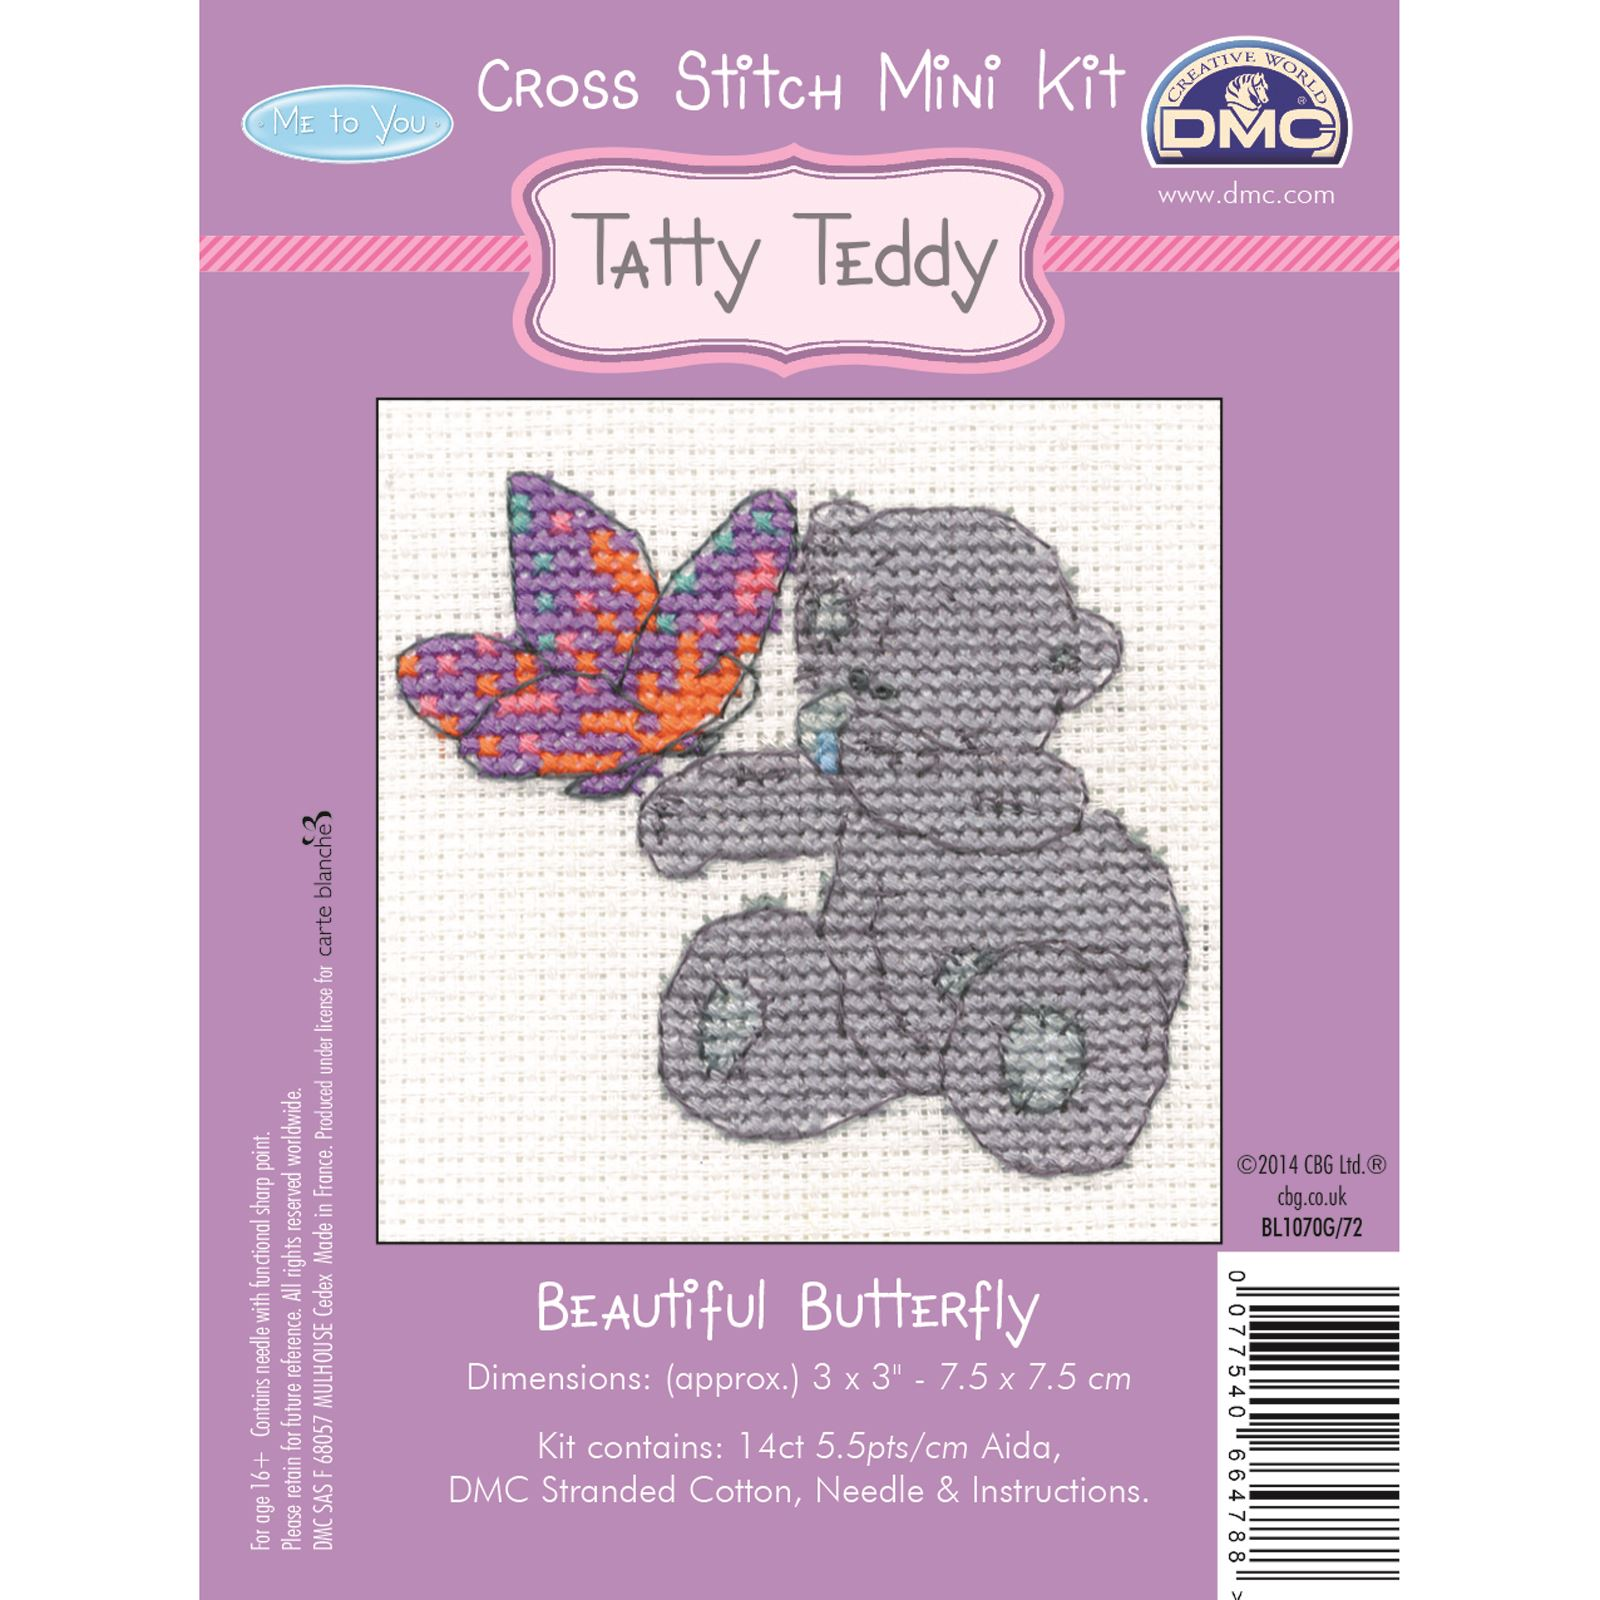 DMC-Mini-Cross-Stitch-Kit-Me-to-You-Tatty-Teddy-8-Designs thumbnail 3